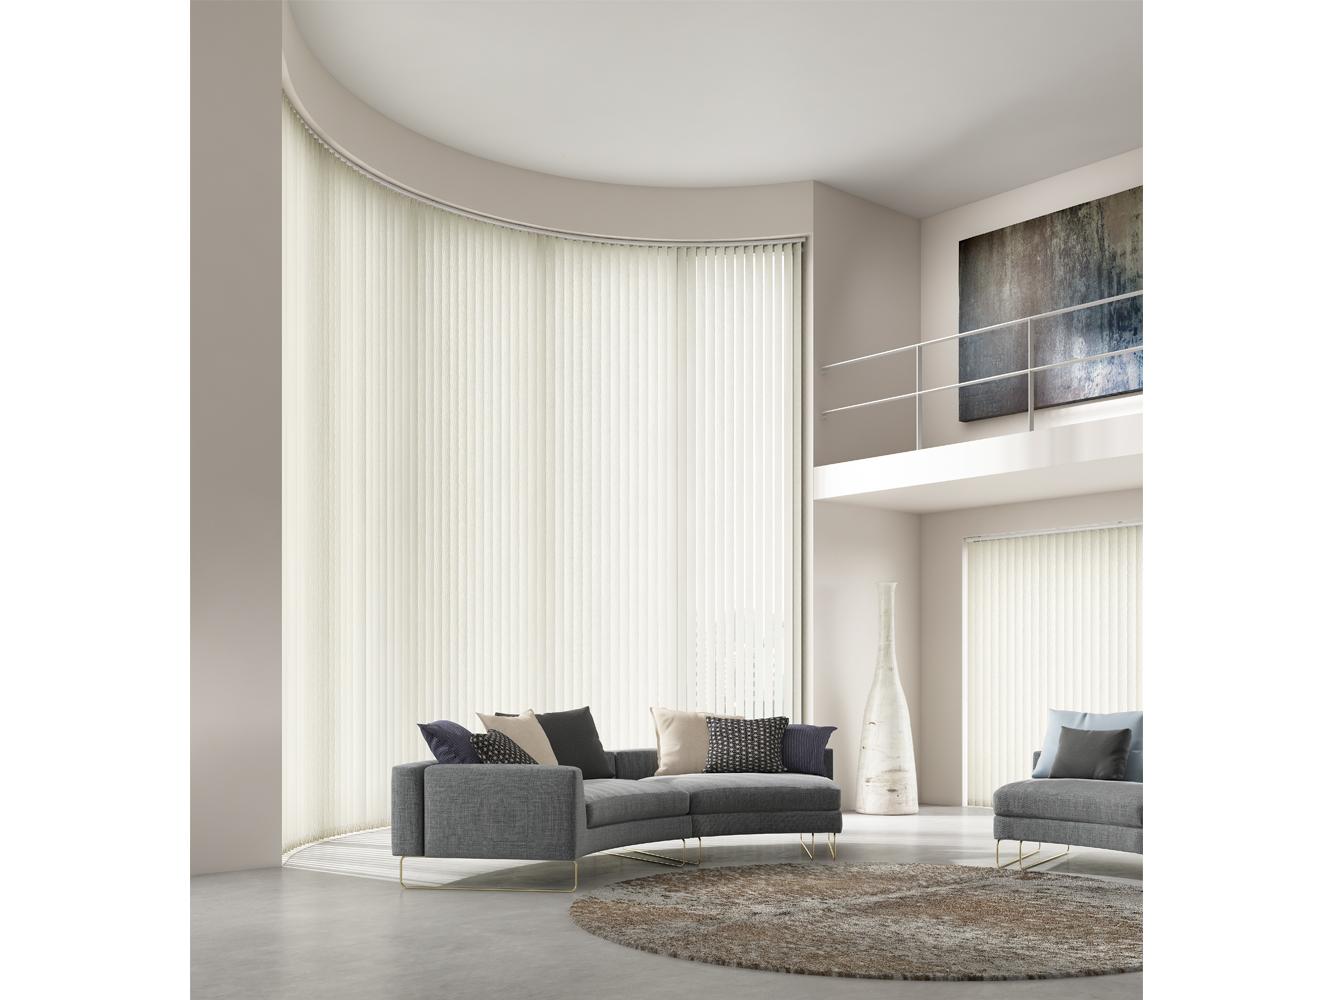 pix-us-cg-white-blinds